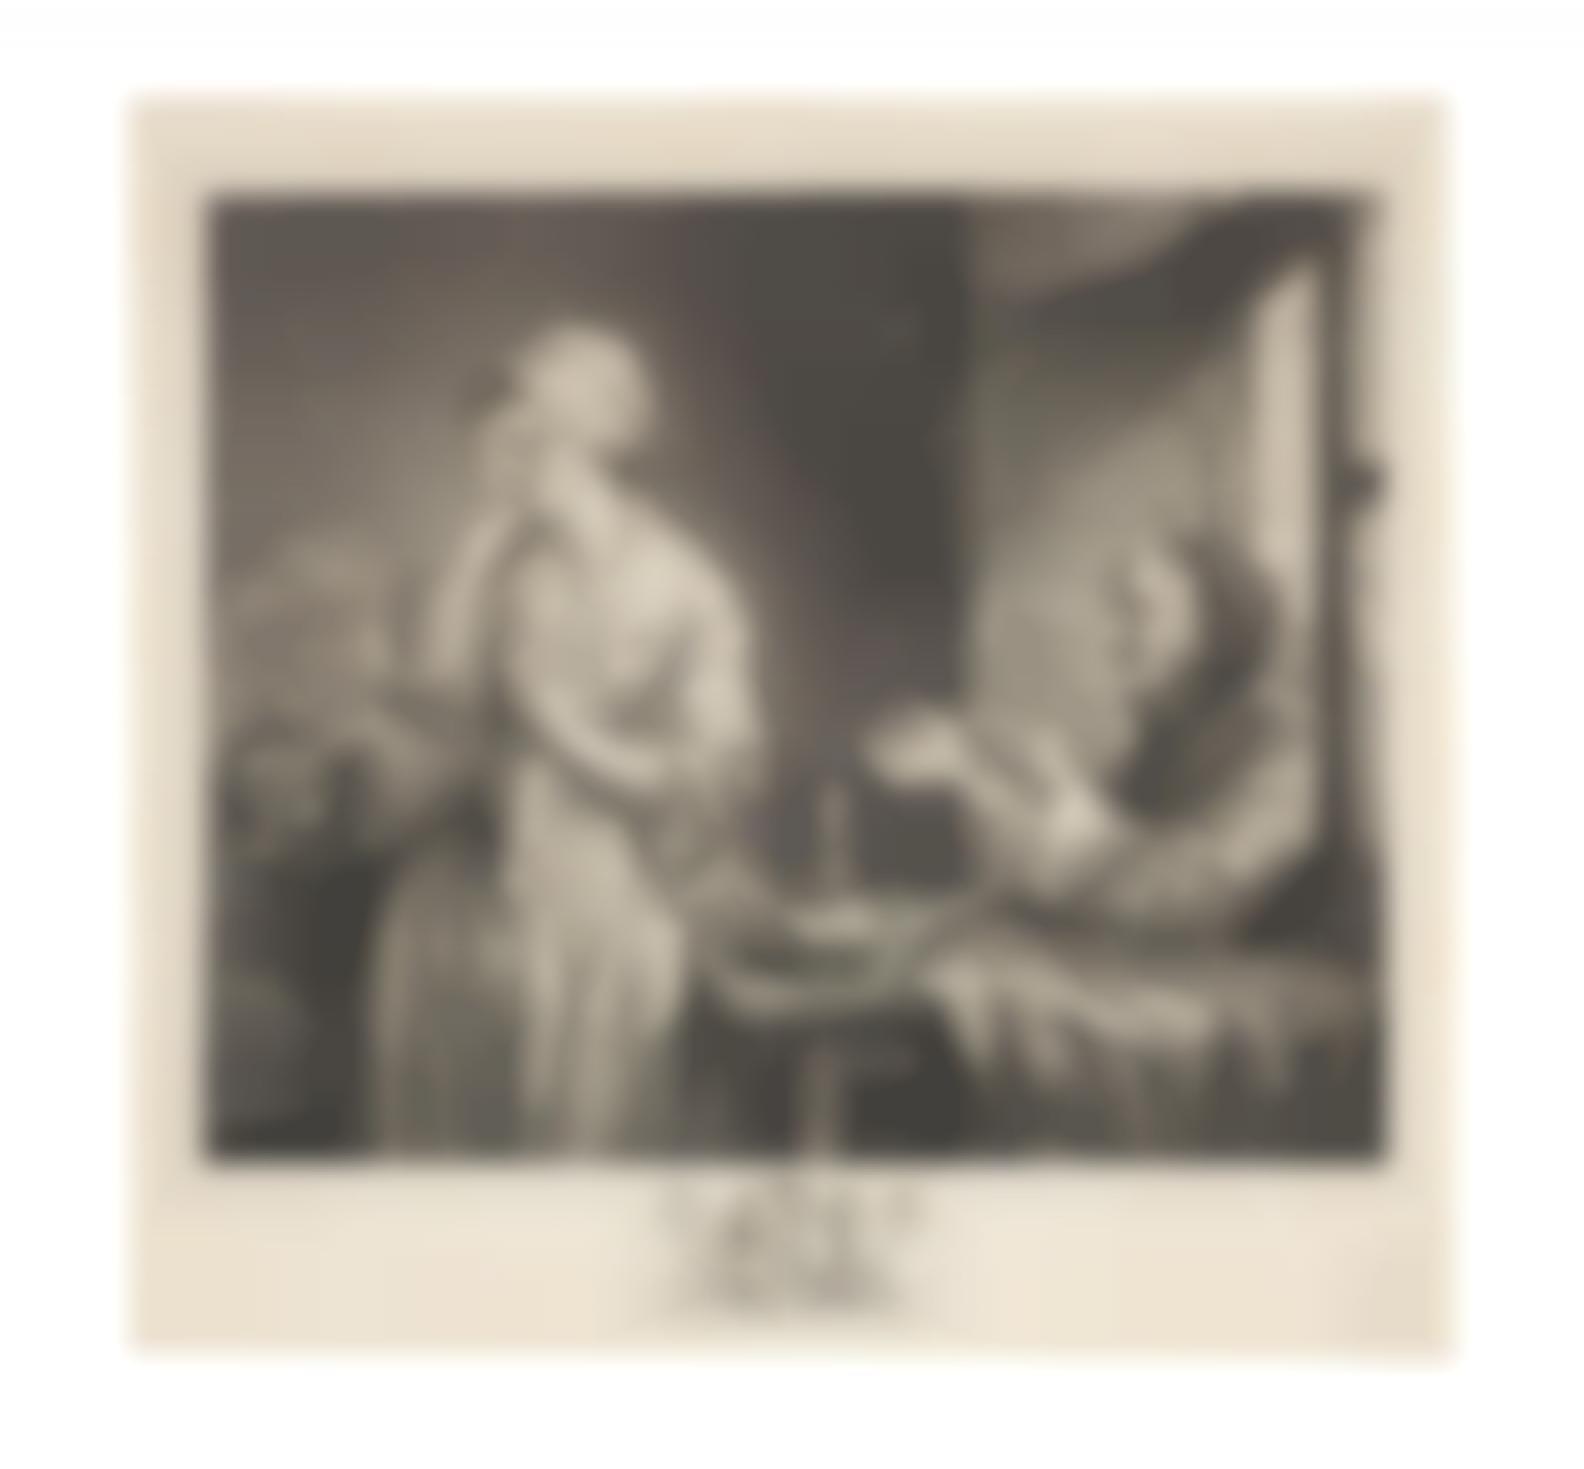 Francois Robert Ingouf - La Fille Confuse; Abraham Bosse - Donner a manger (D.50) and Donner a boire (D.51)-1773